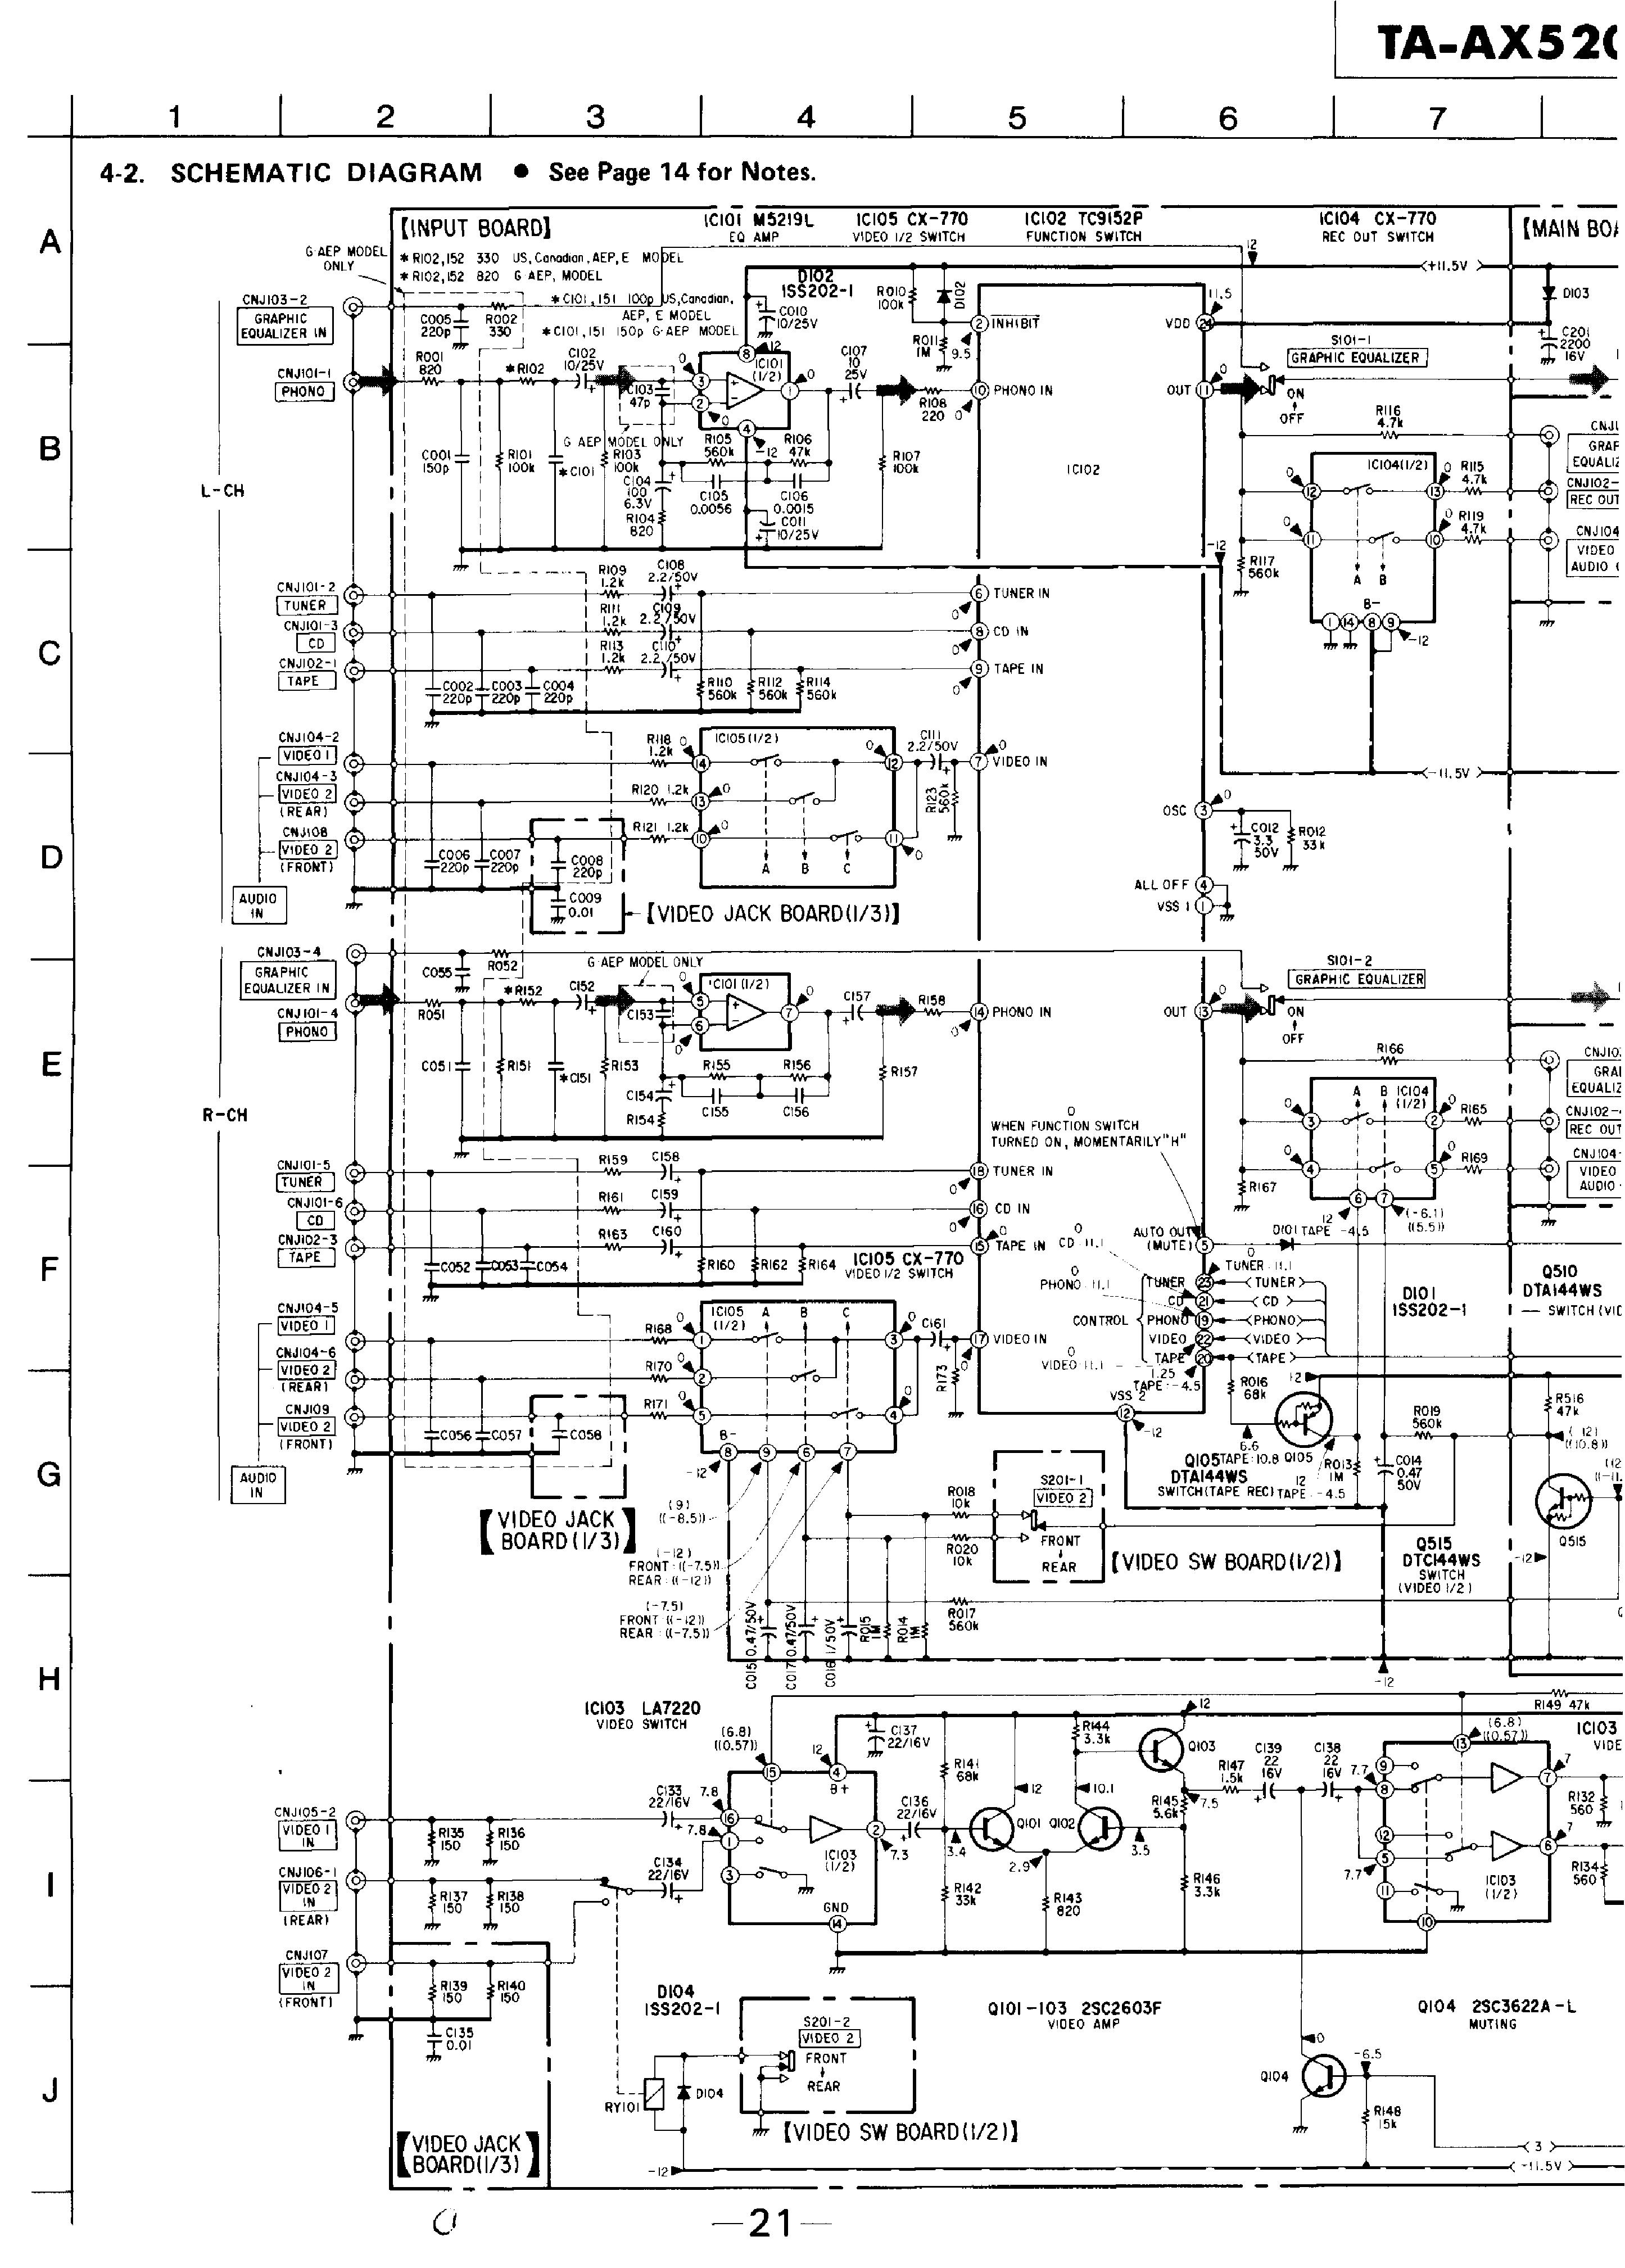 Sony Amplifier Circuit Diagram Electrical Wiring Diagrams Index 29 Audio Seekiccom Schematics Trusted U2022 Mos Fet